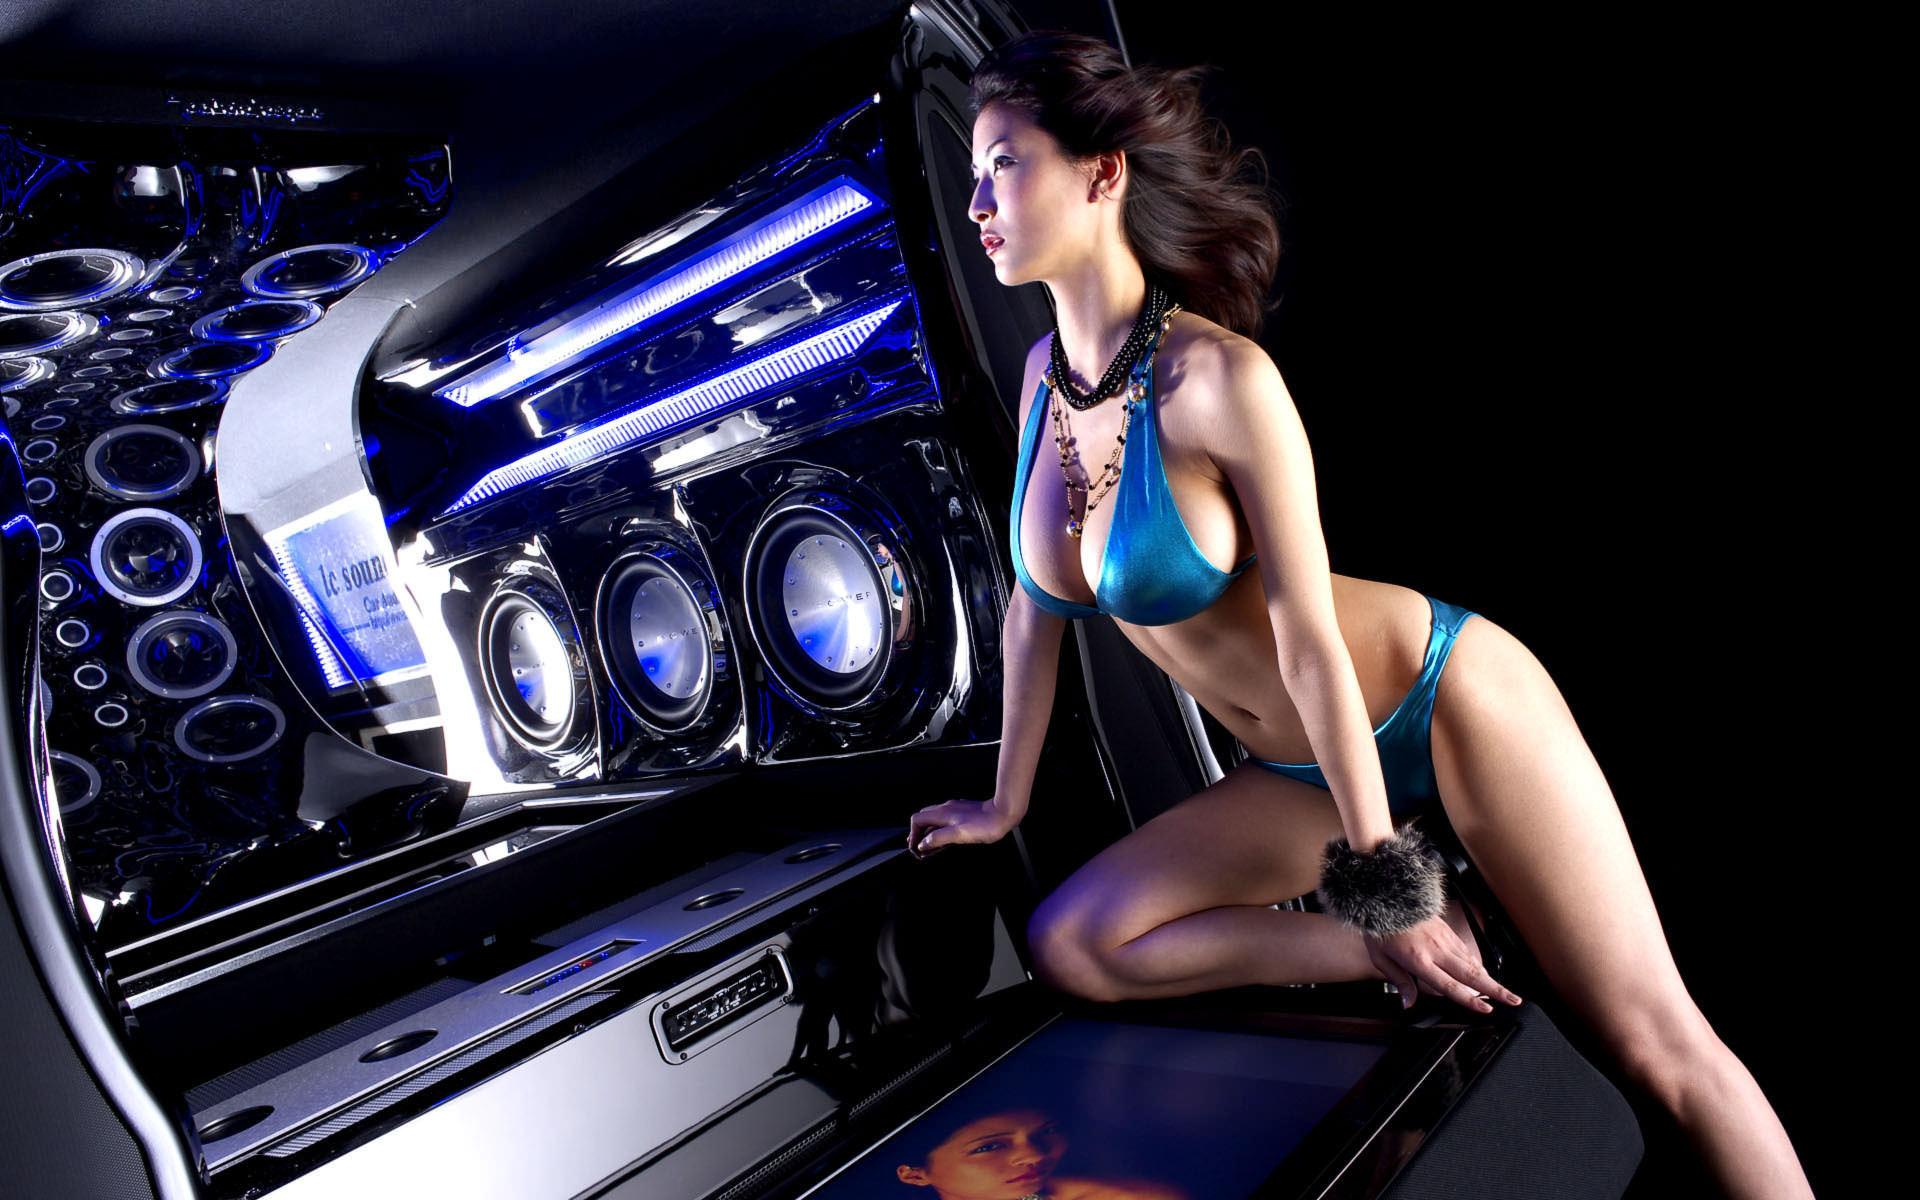 muzikalnoe-eroticheskoe-shou